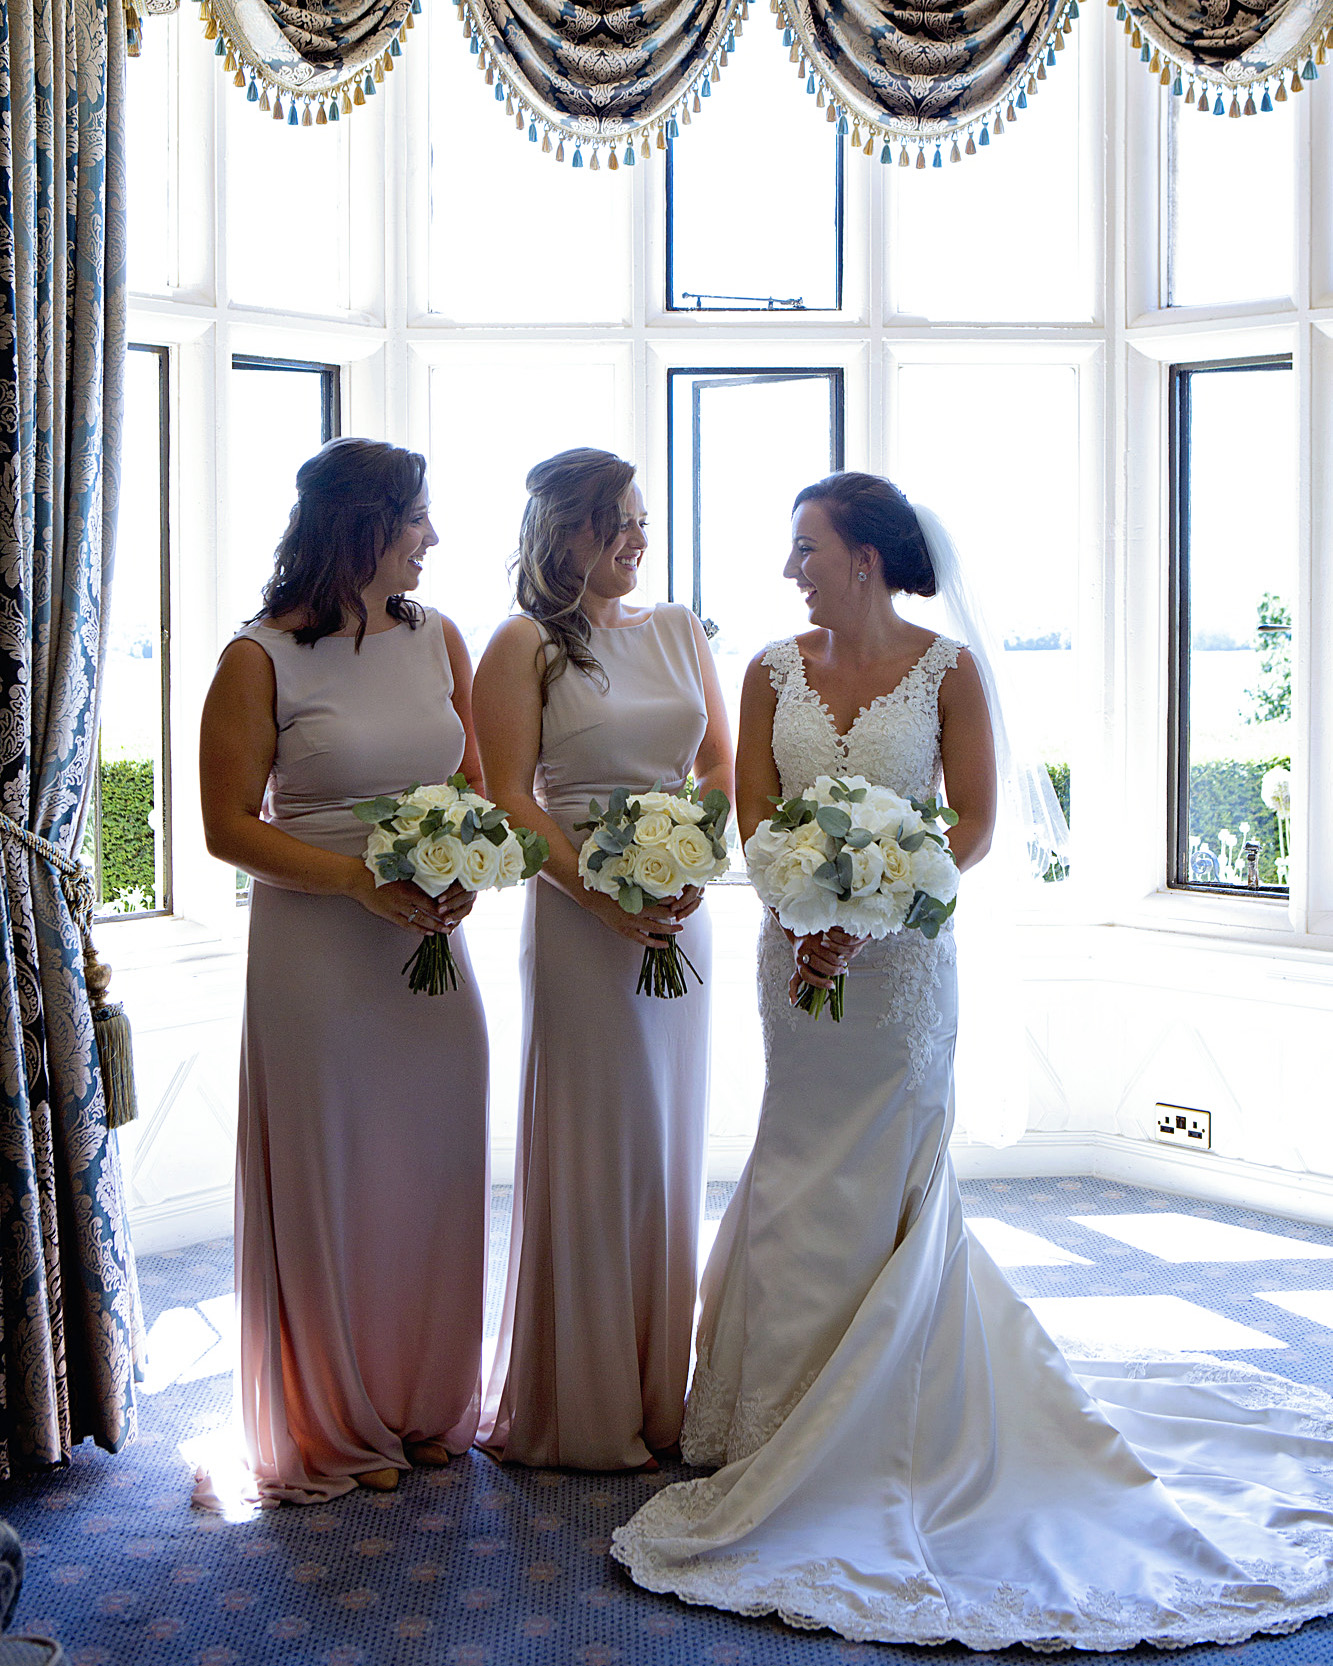 wedding-barnsdale-hall (7).jpg